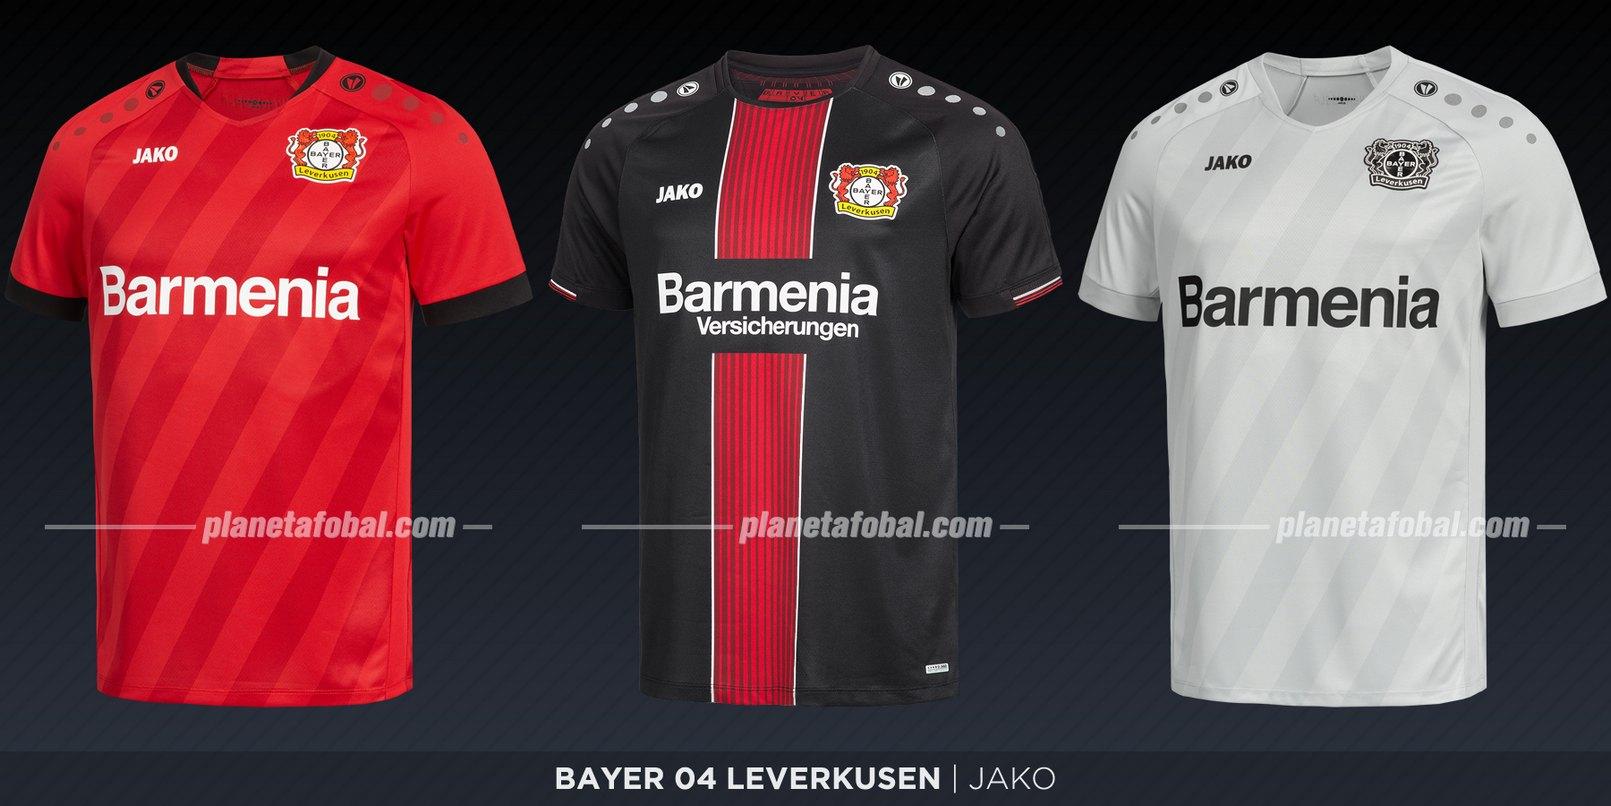 Bayer 04 Leverkusen (Jako) | Camisetas de la Bundesliga 2019-2020